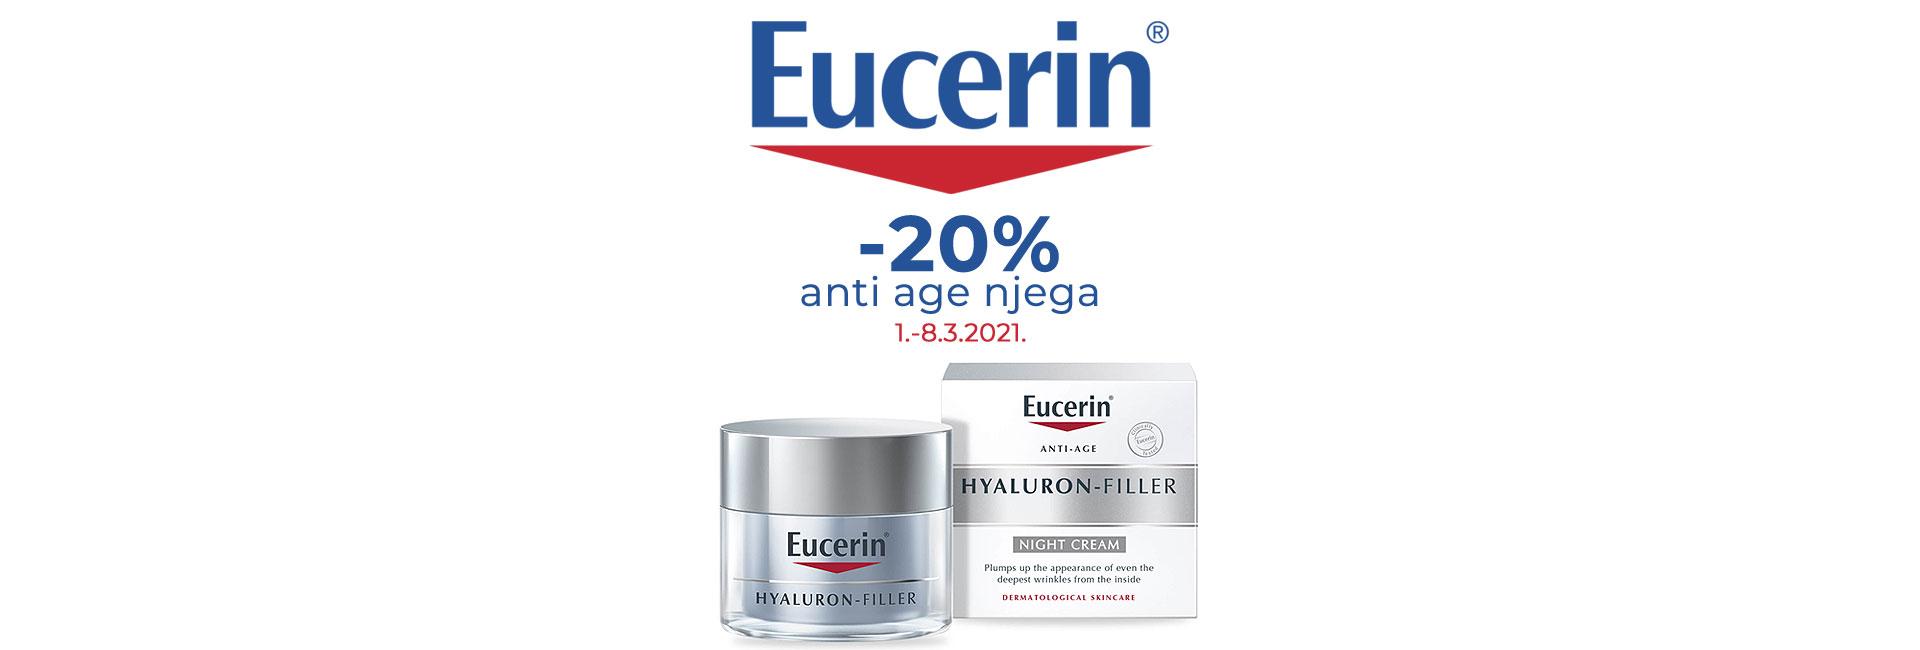 eucerin -20% 1.-8.3.2021.